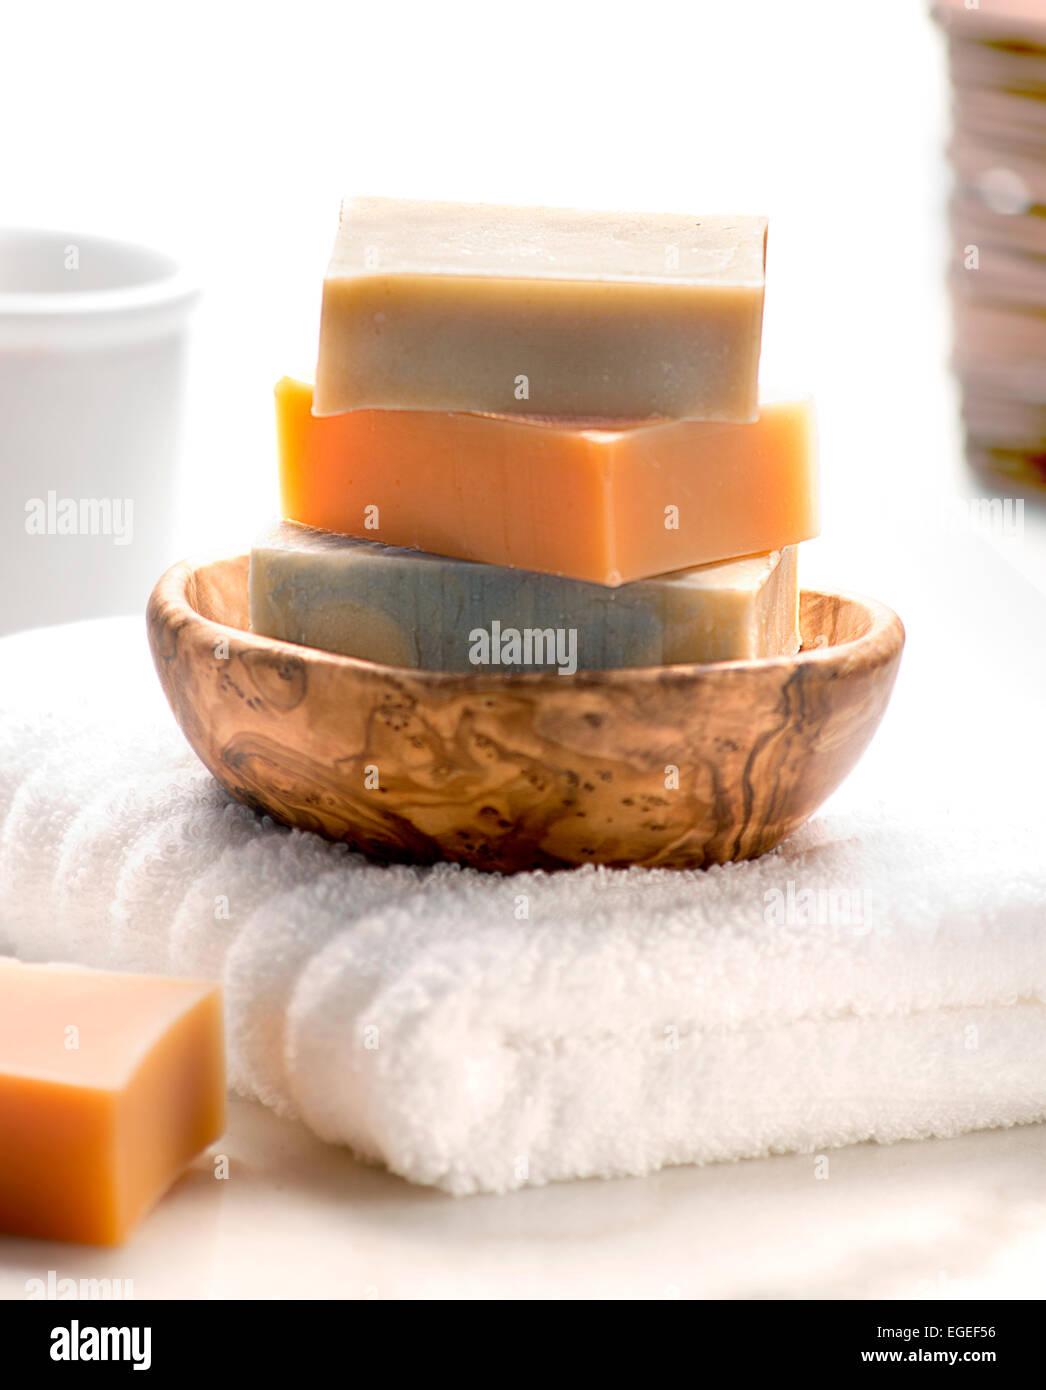 soap - Stock Image